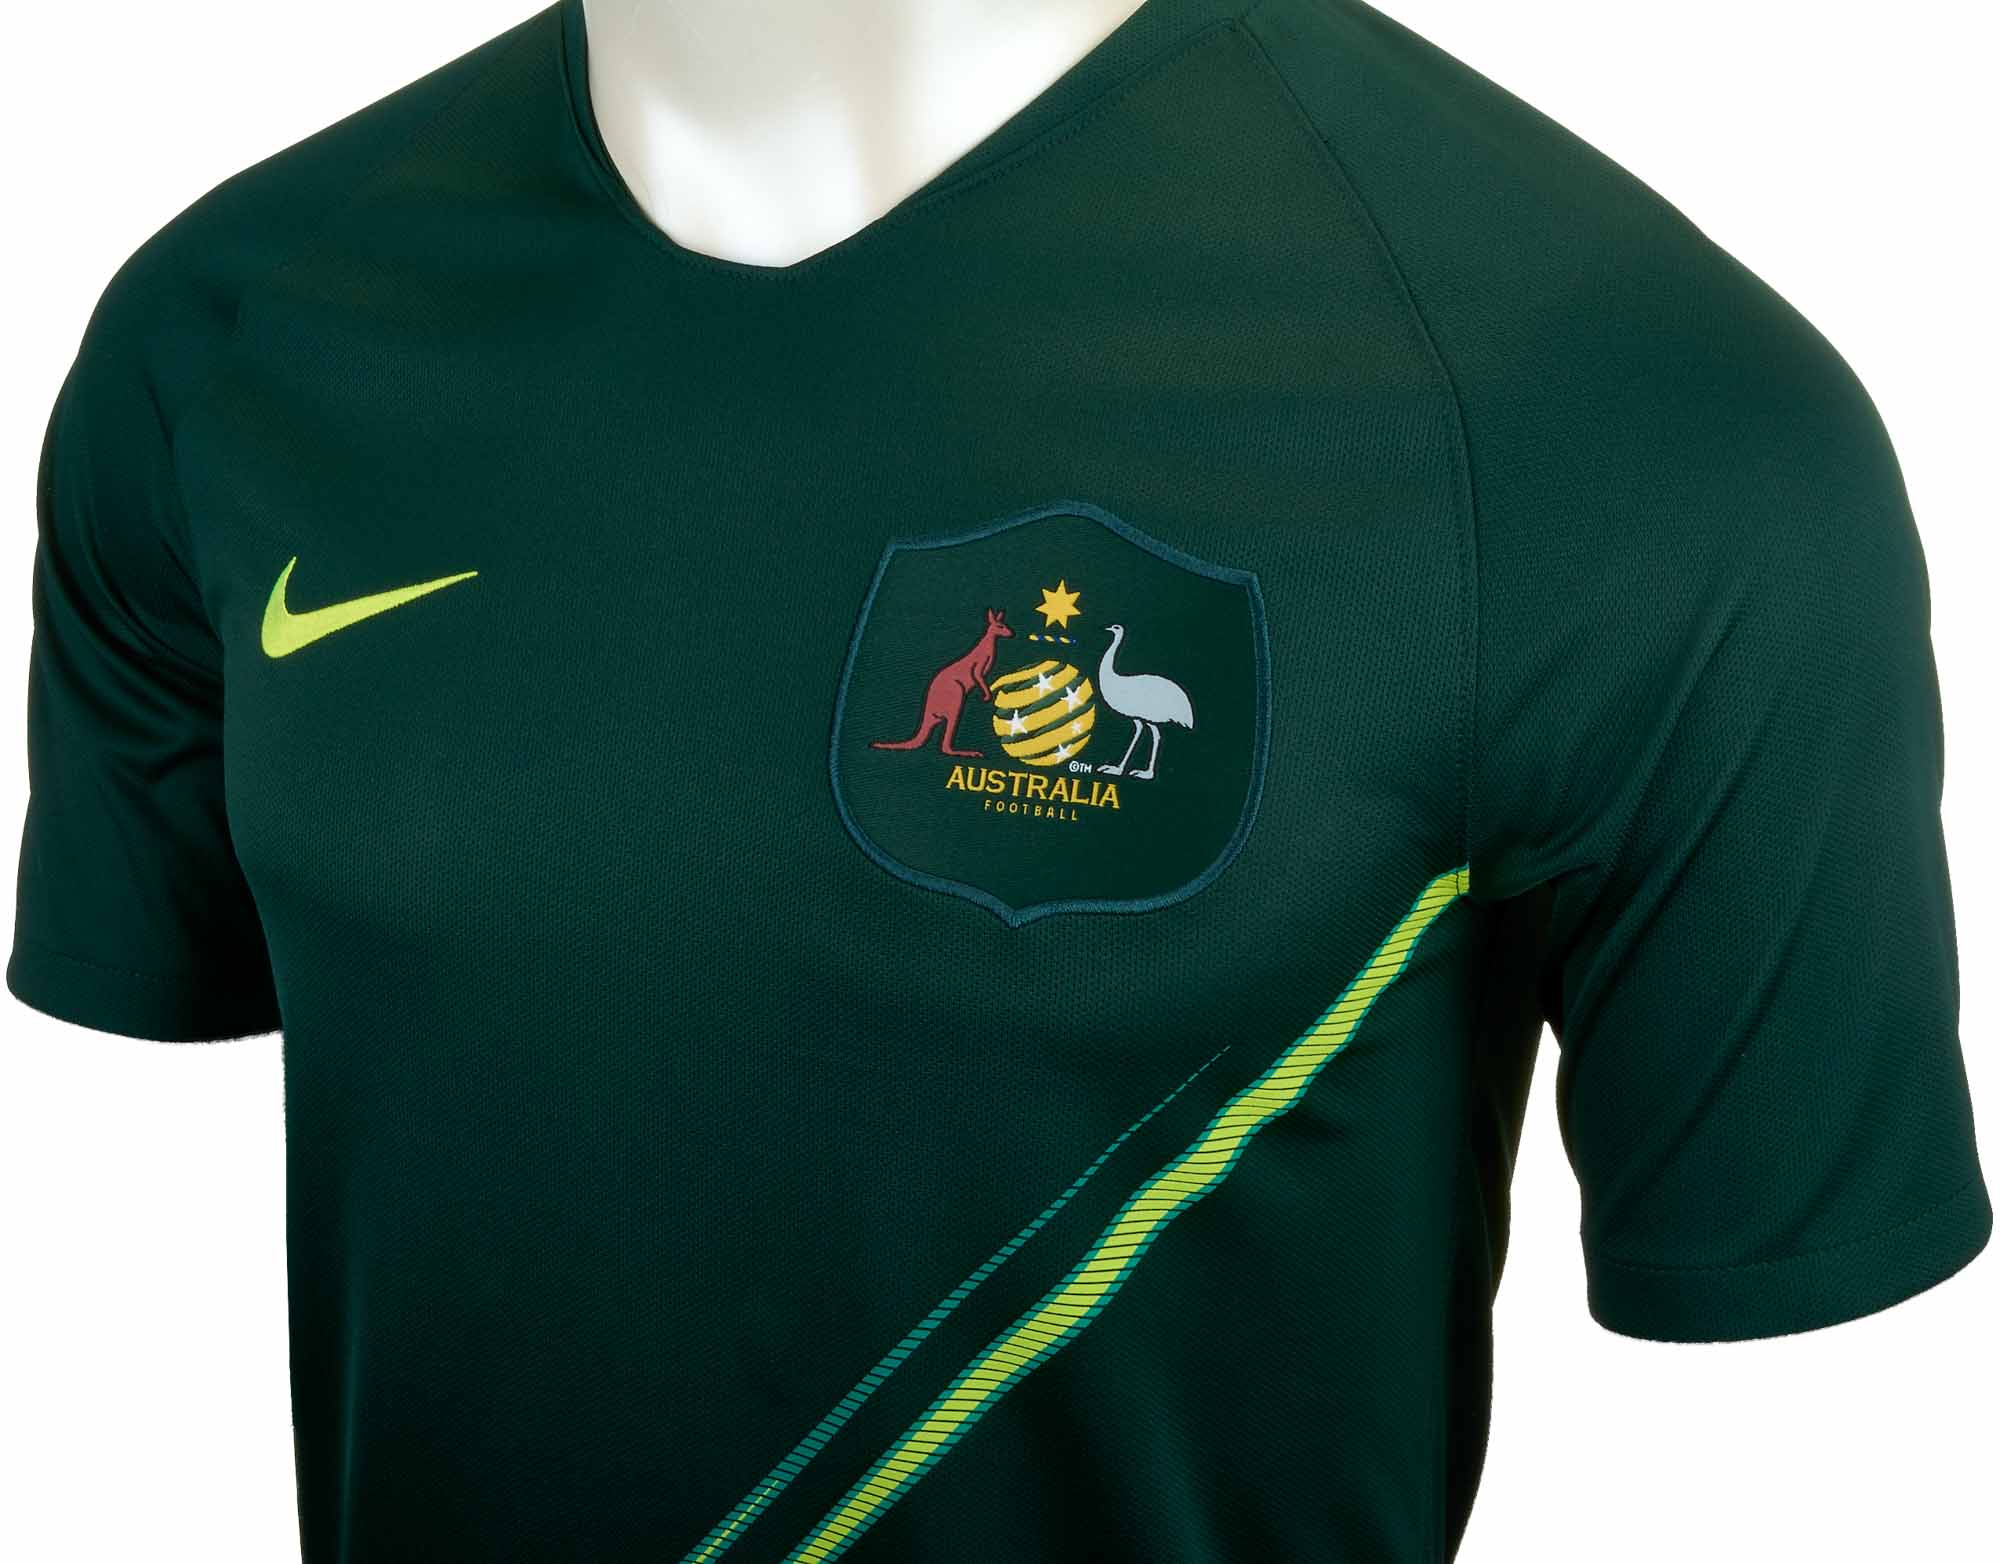 2590548ef50 Nike Australia Away Jersey 2018-19 - Soccer Master